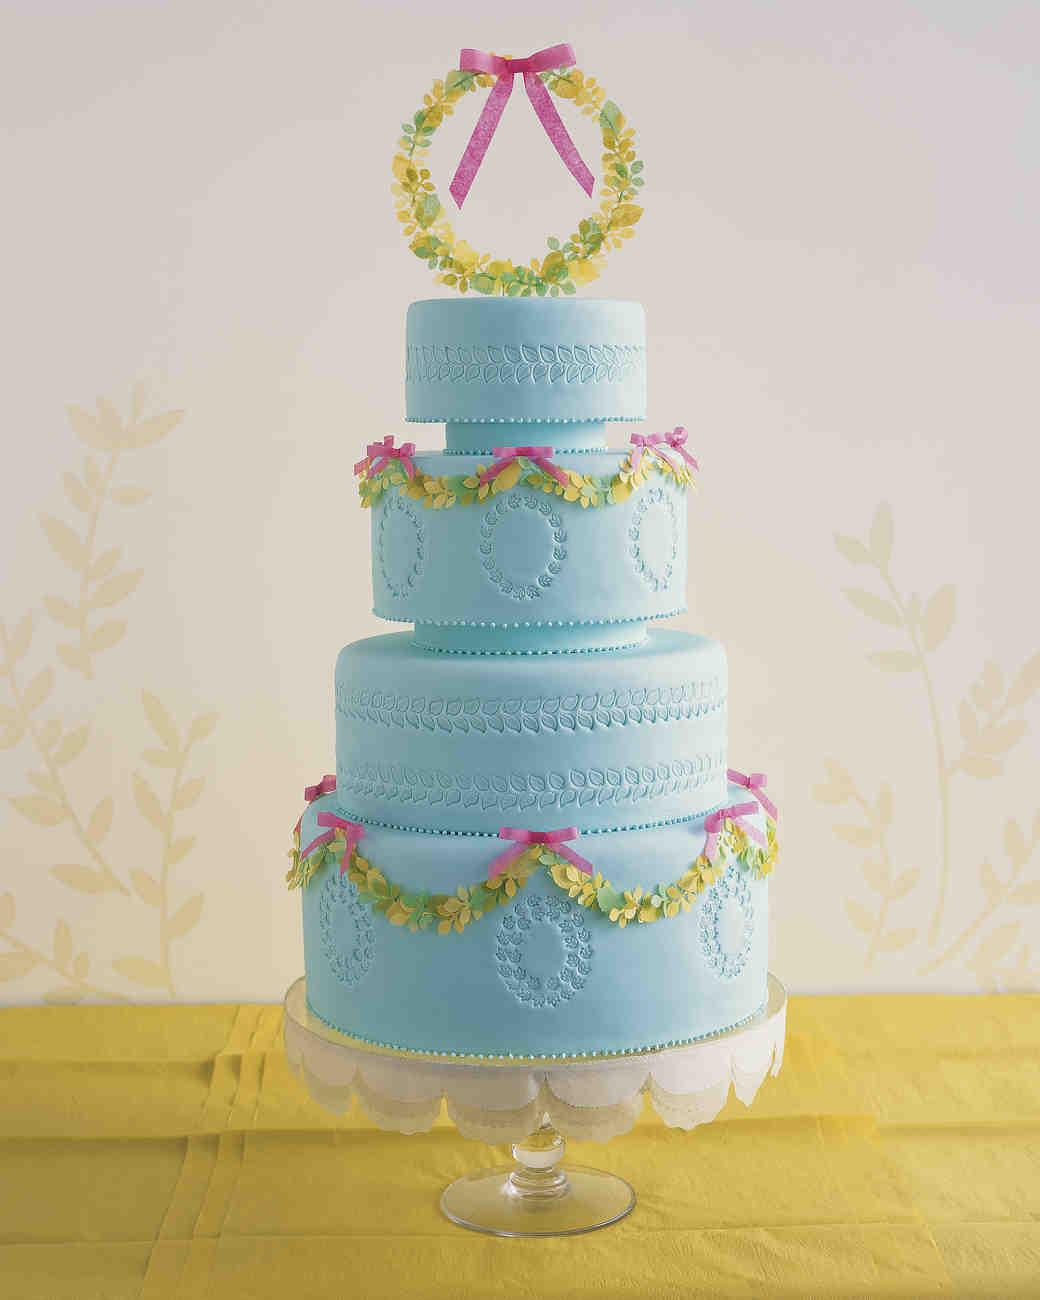 bow-cakes-mwa102001-0515.jpg